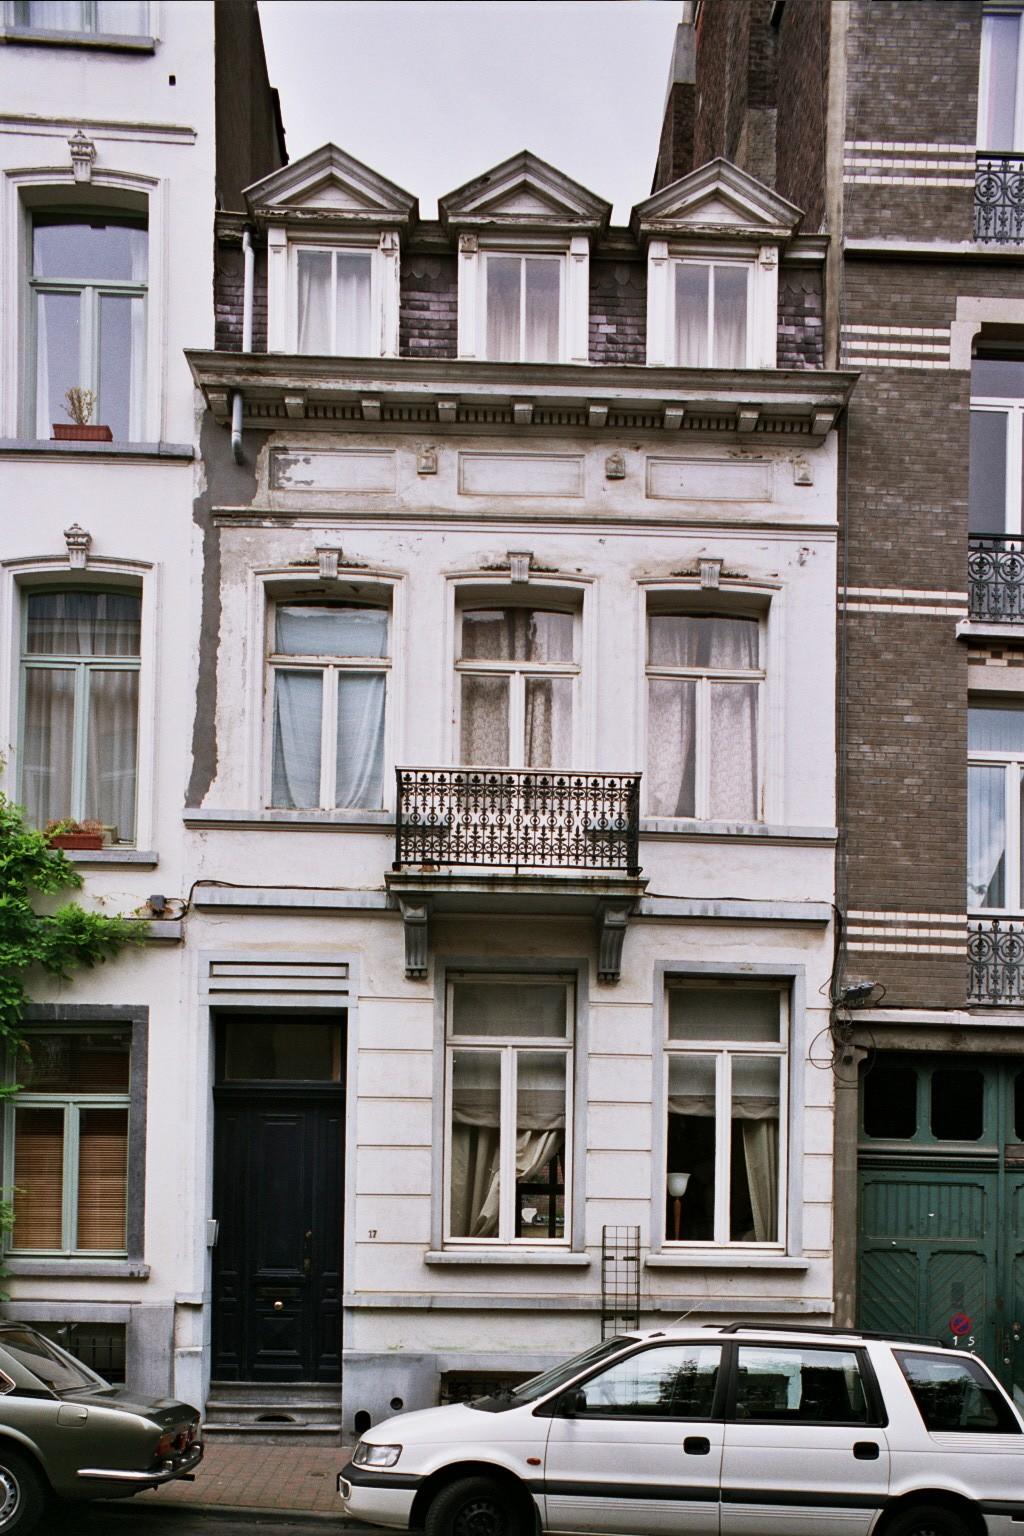 Witte-Bergstraat 17., 2004